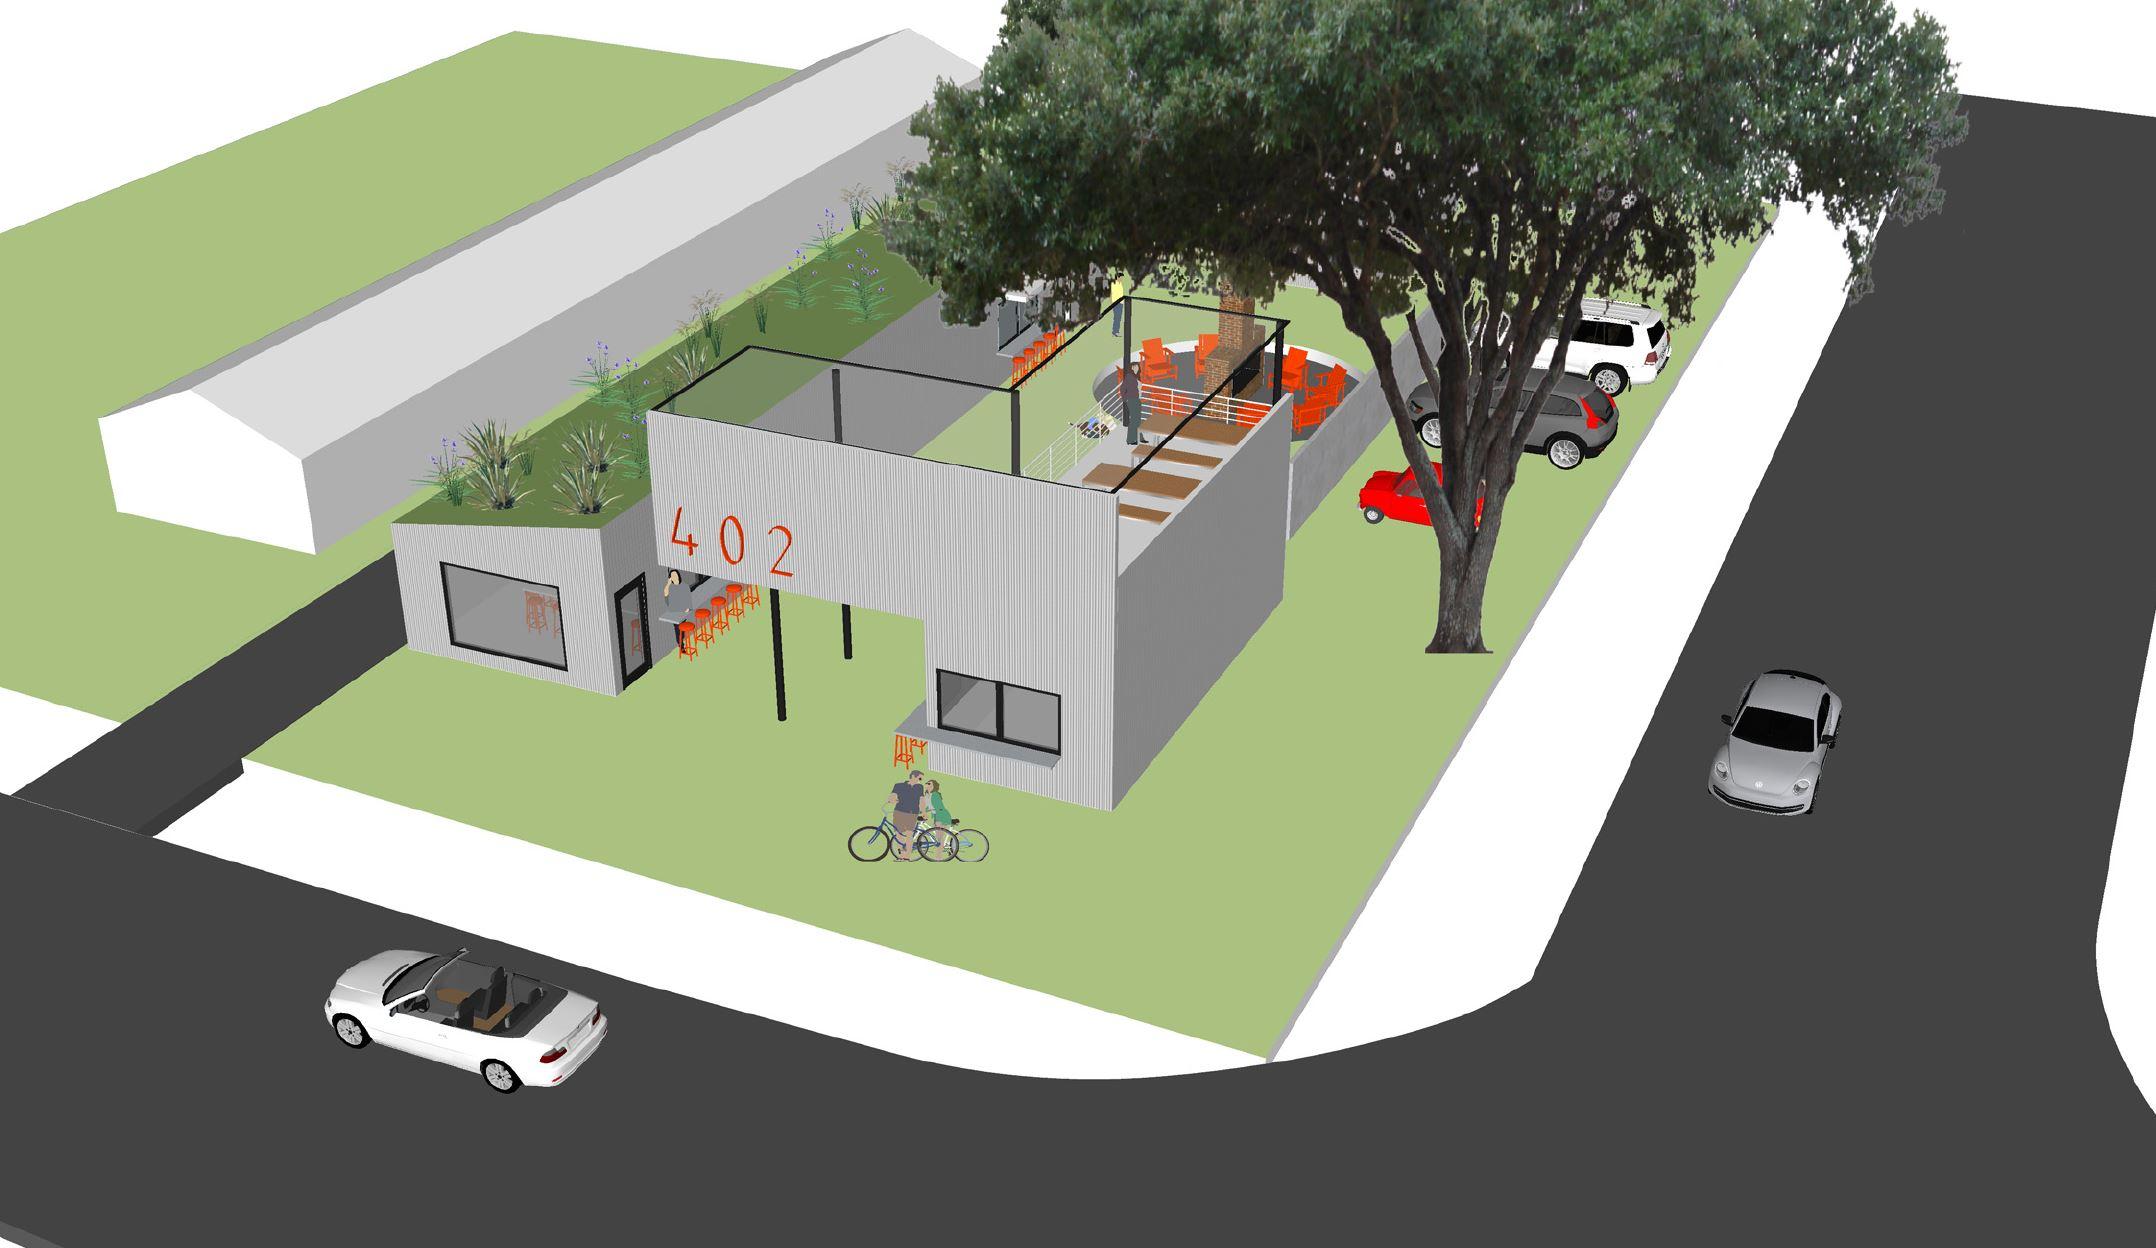 Tall Architects - 402 Porter Avenue Development - Ocean Springs, MS